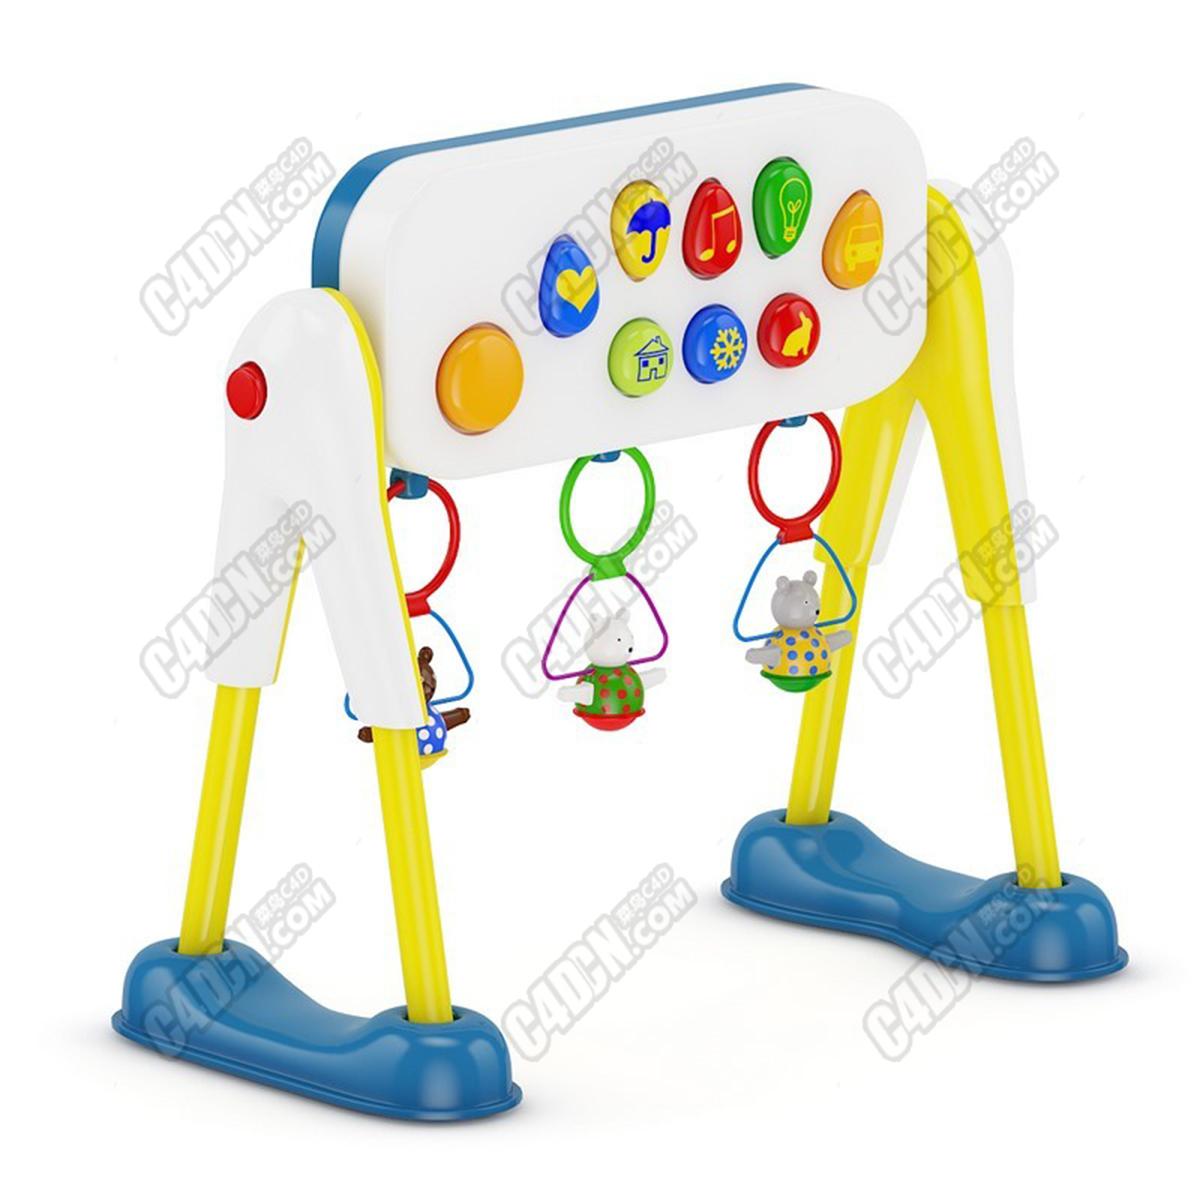 C4D幼兒園小熊益智智力開發兒童玩具模型 A toy model for children's intelligence development in C4d kindergarten